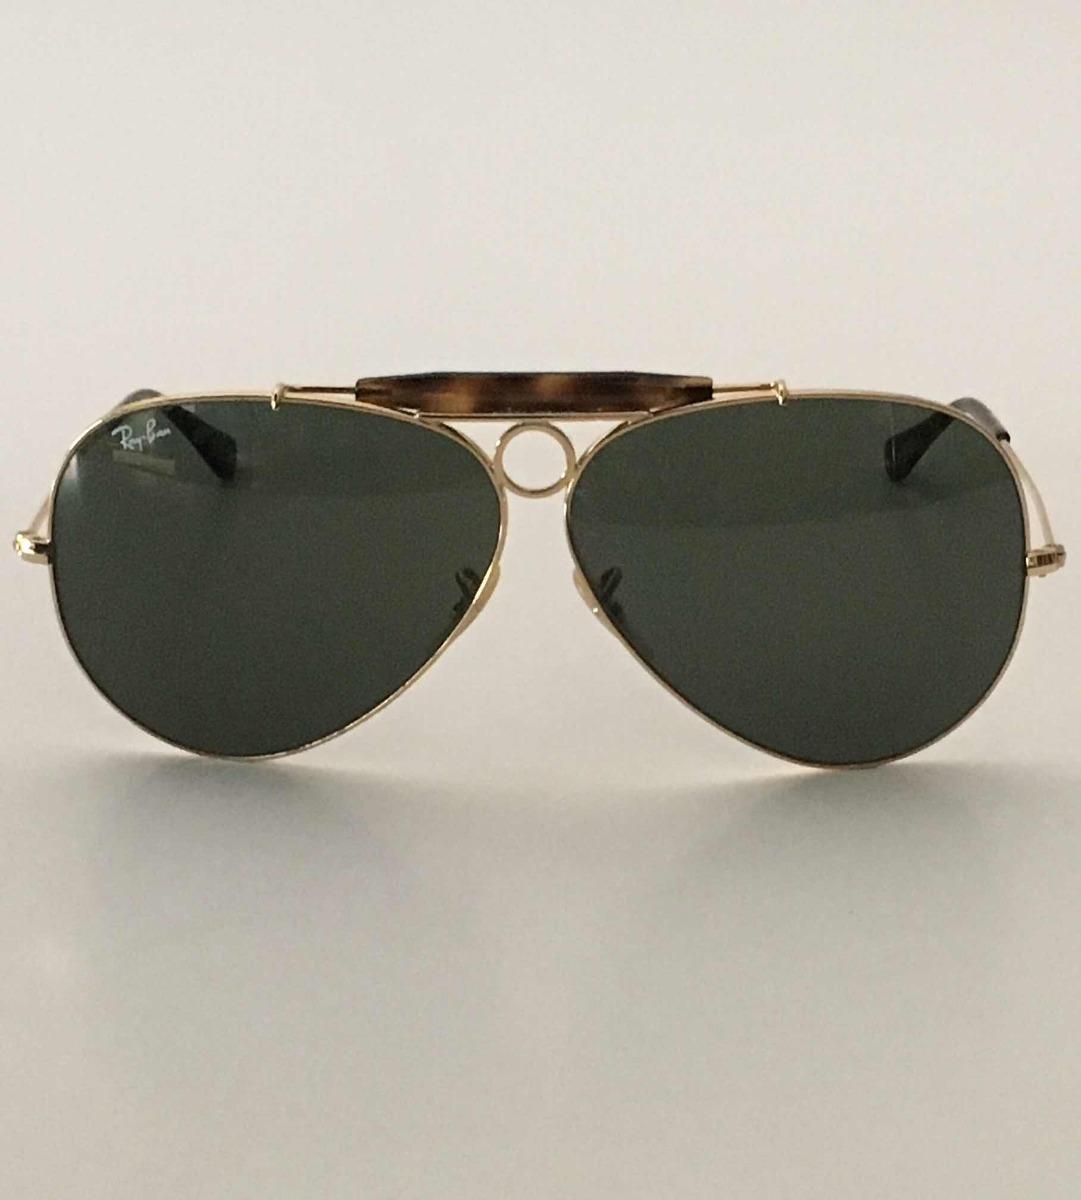 88f1fcd624a77 Óculos De Sol Ray Ban Rb3138 Shooter 181 62 09 3n - R  350,00 em ...